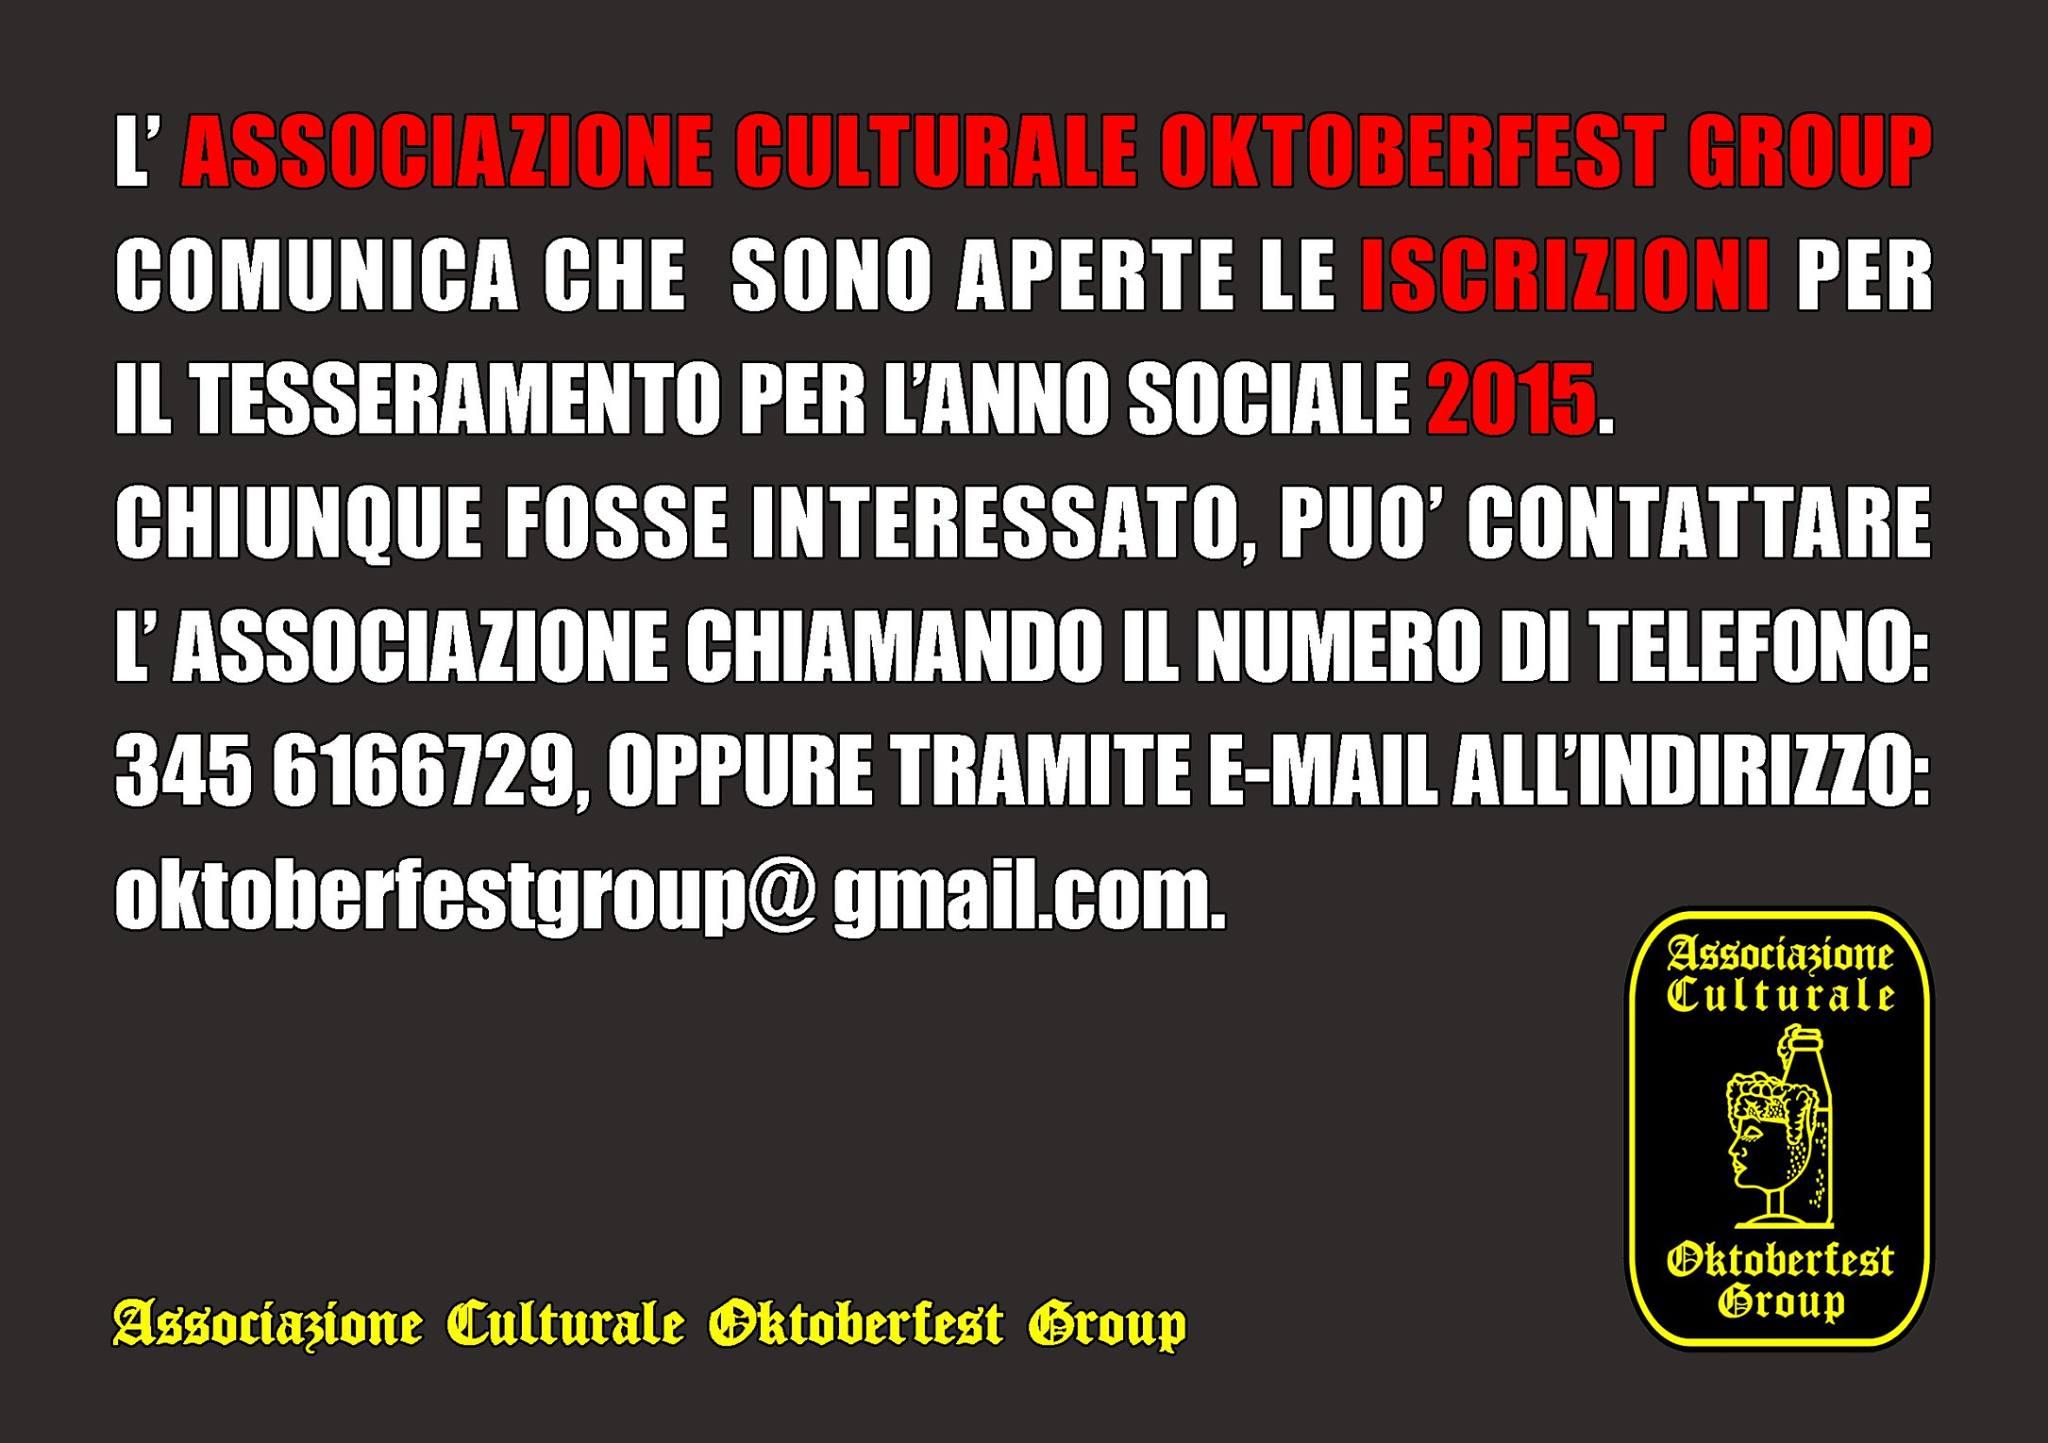 Oktoberfest Group, campagna iscrizioni 2015